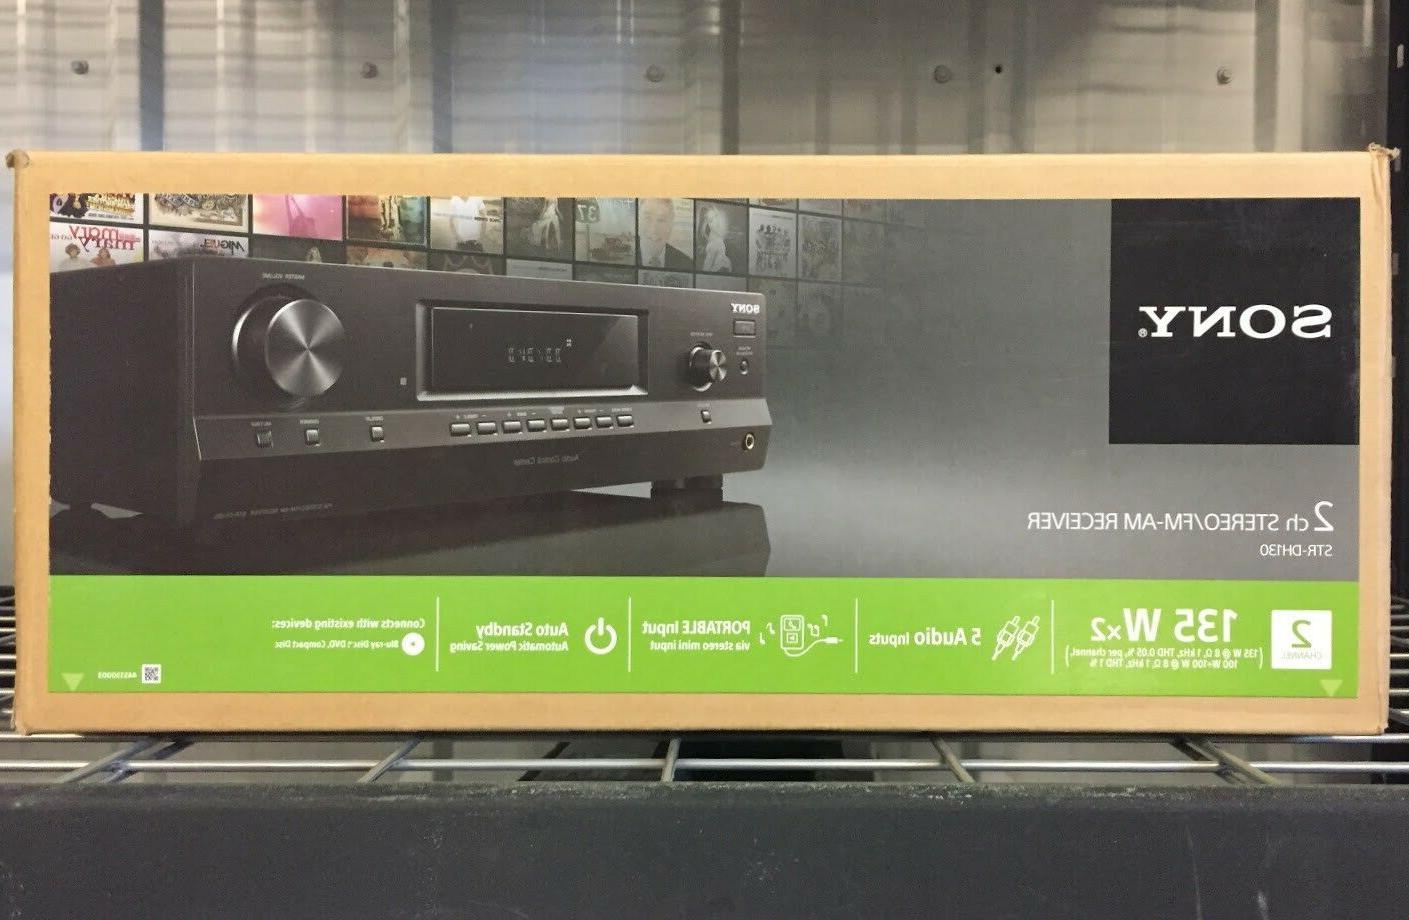 Sony STR STR-DH130 Channel 100 Watt Receiver New**